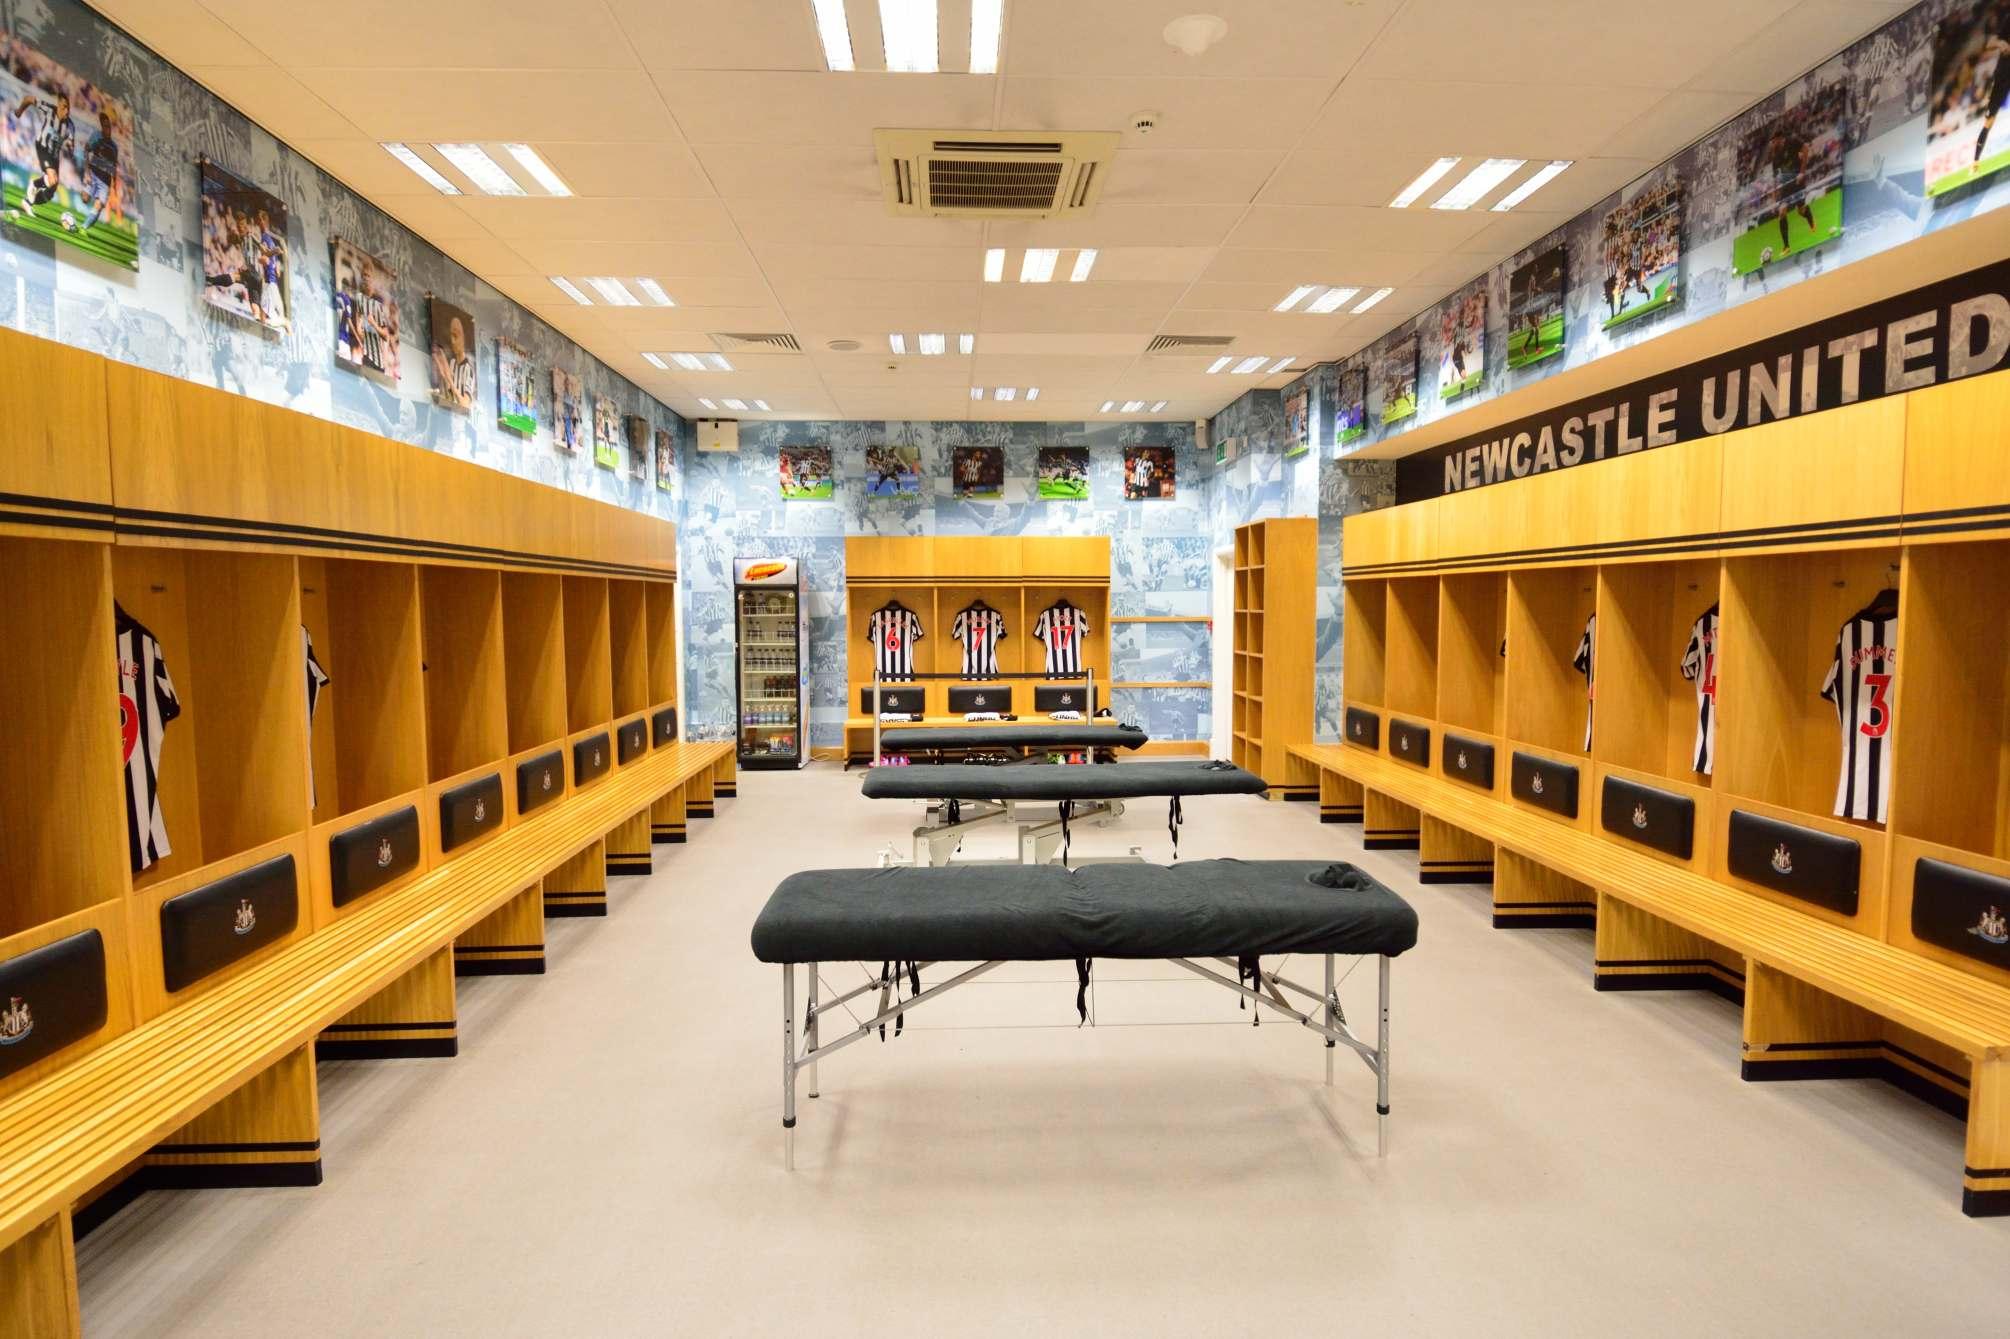 nufc tours Newcastle United Stadium Tours for Fans